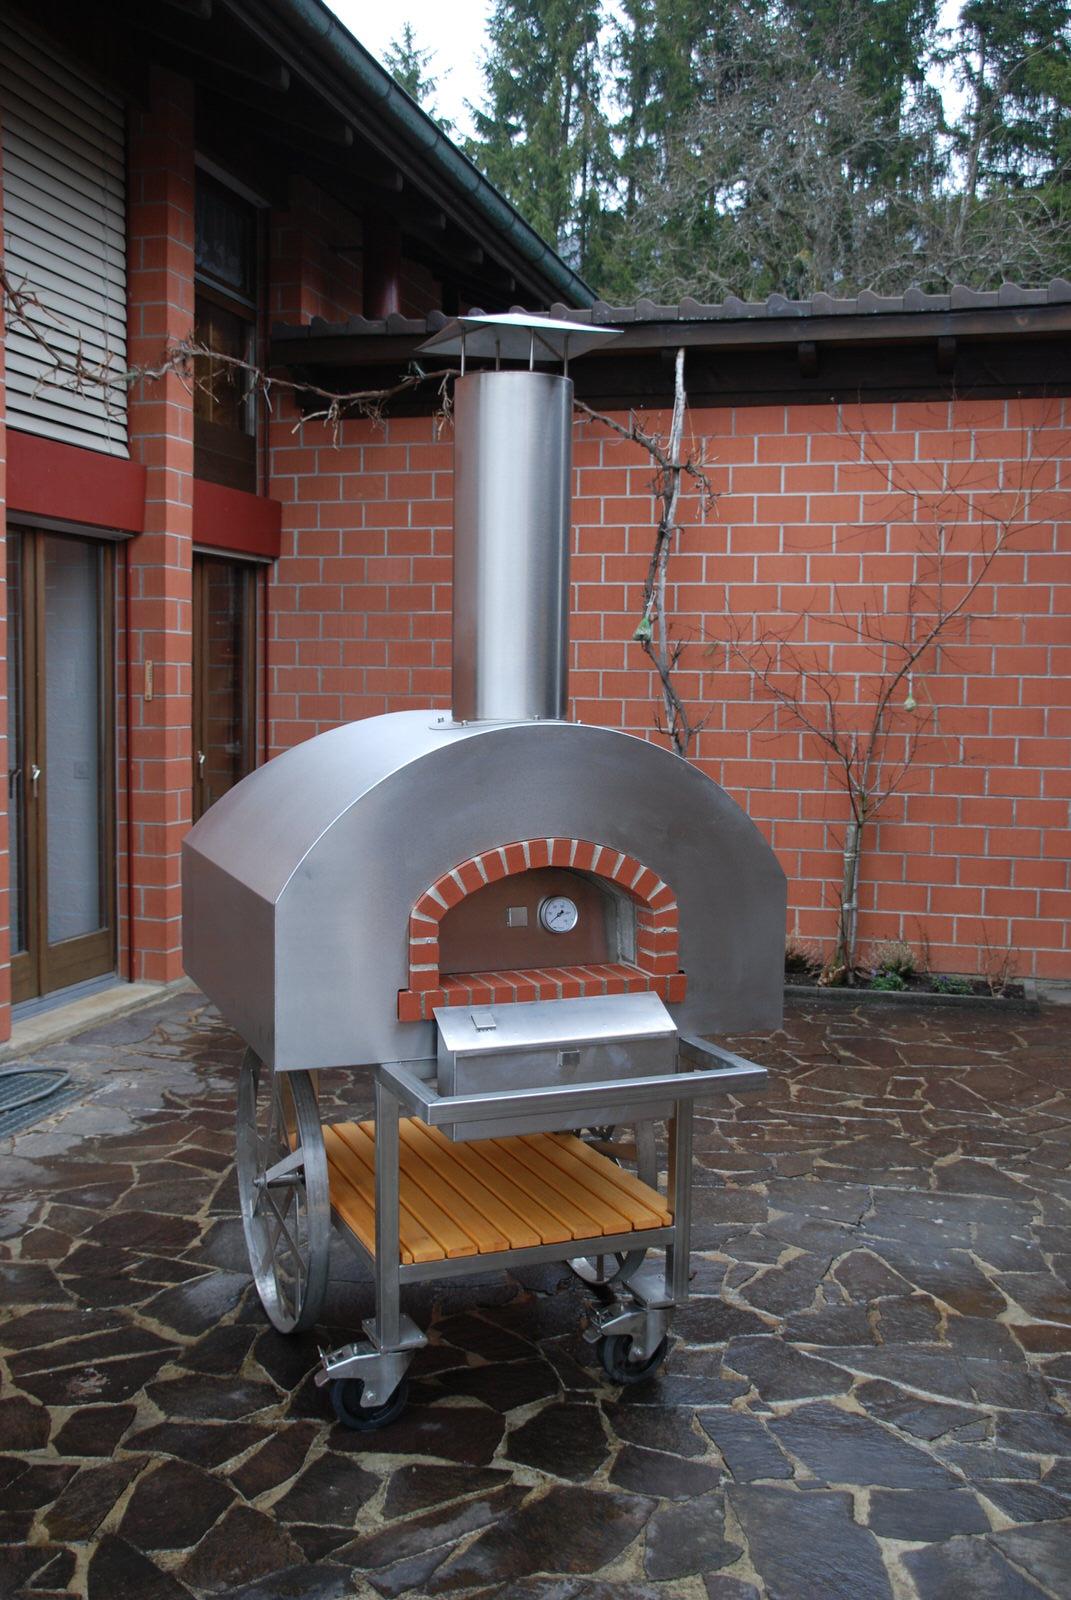 Kohlerpizzabacker Miete Zubehor Ch Kohler Ofenbau Seewen So